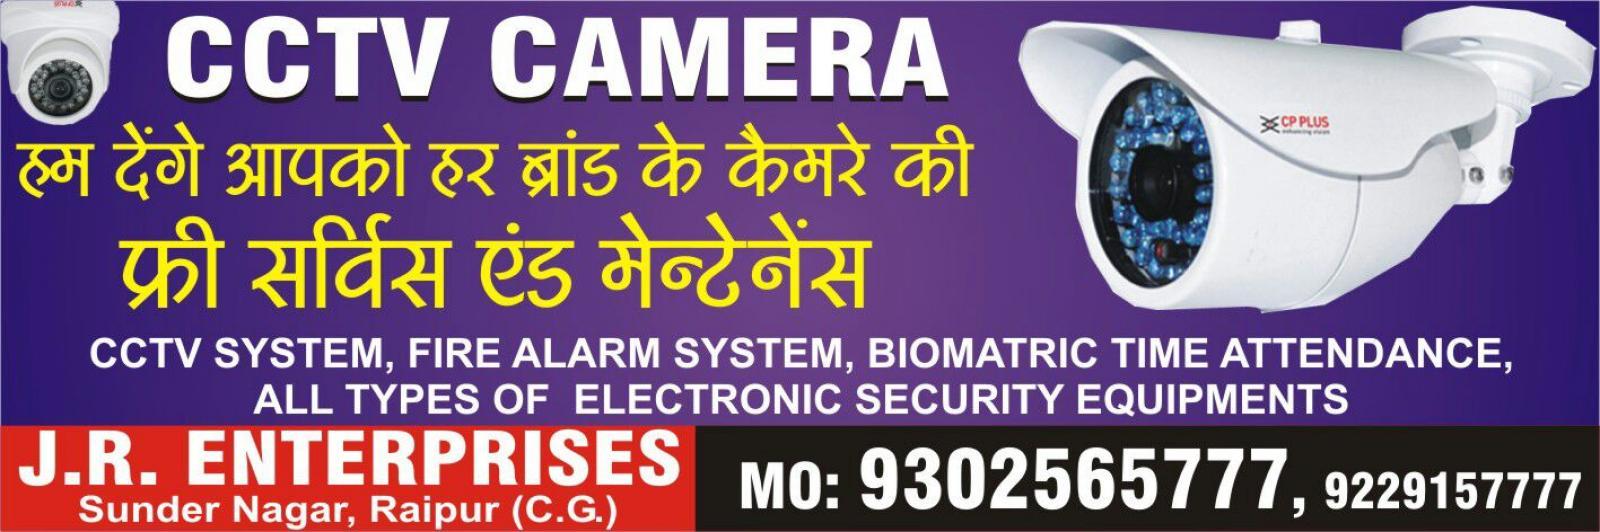 Cctv Cameras,fire Alarm System